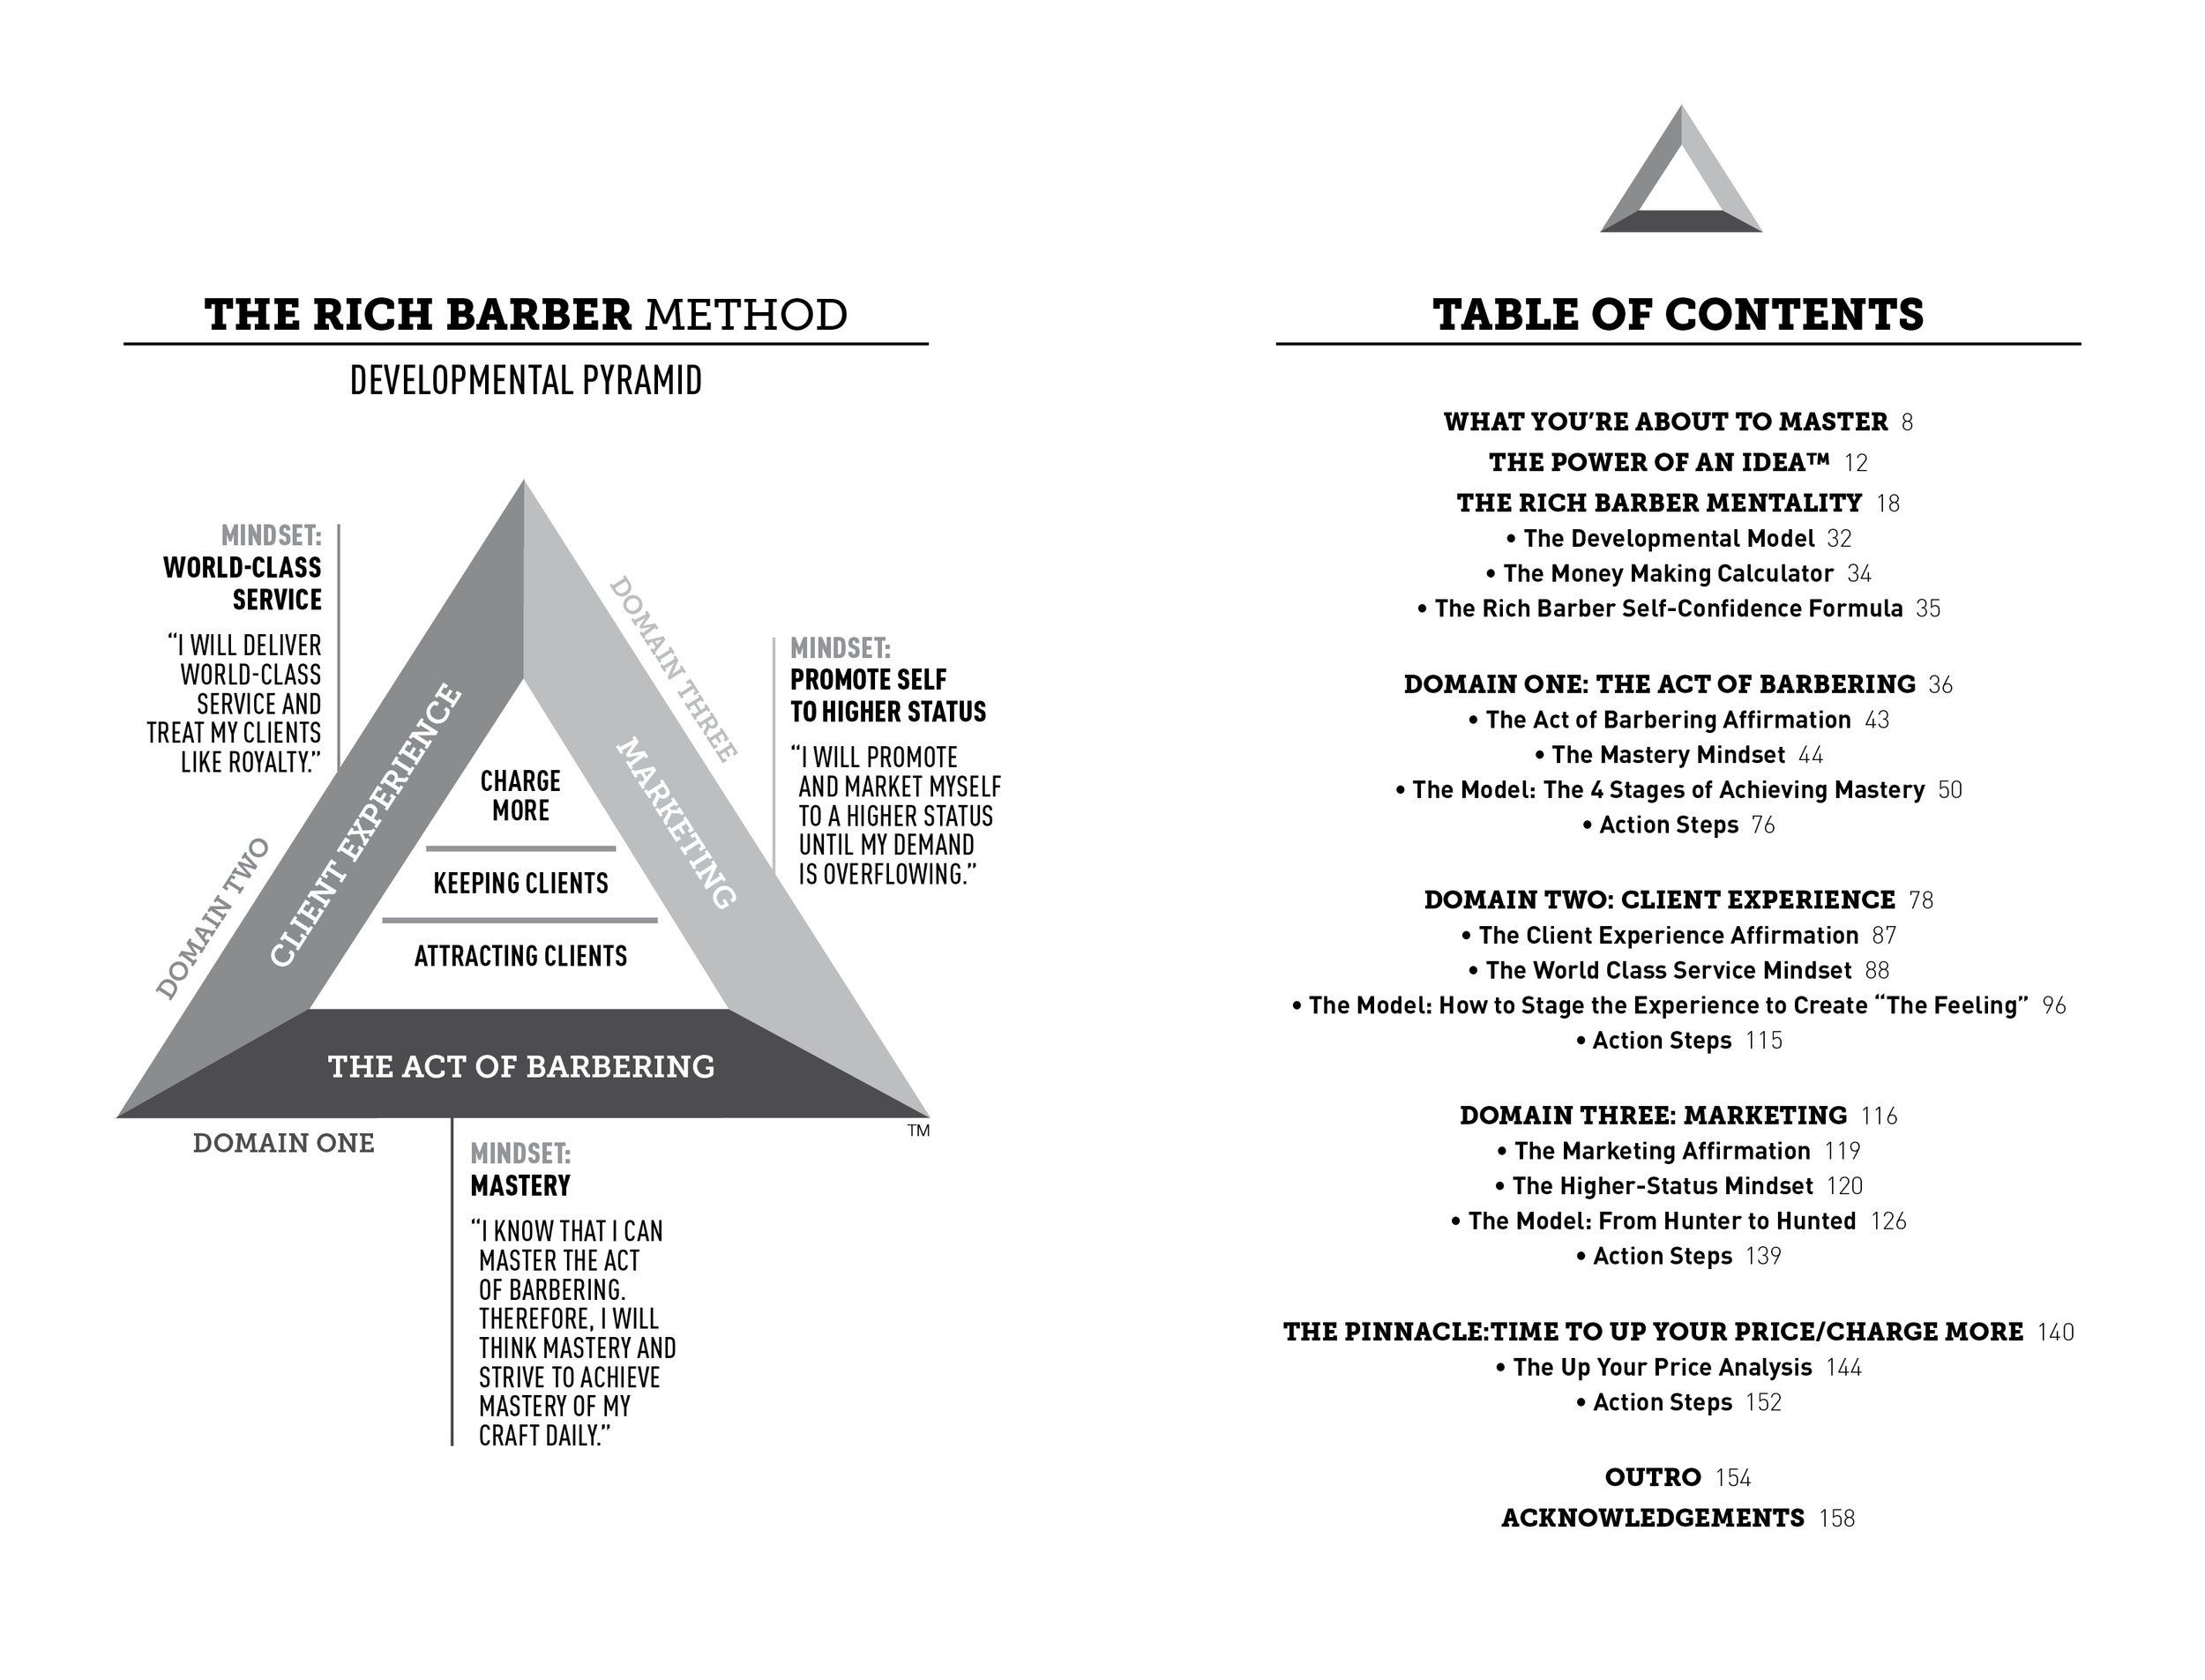 Rich_Barber_Method_Book_FINAL_6-7.jpg